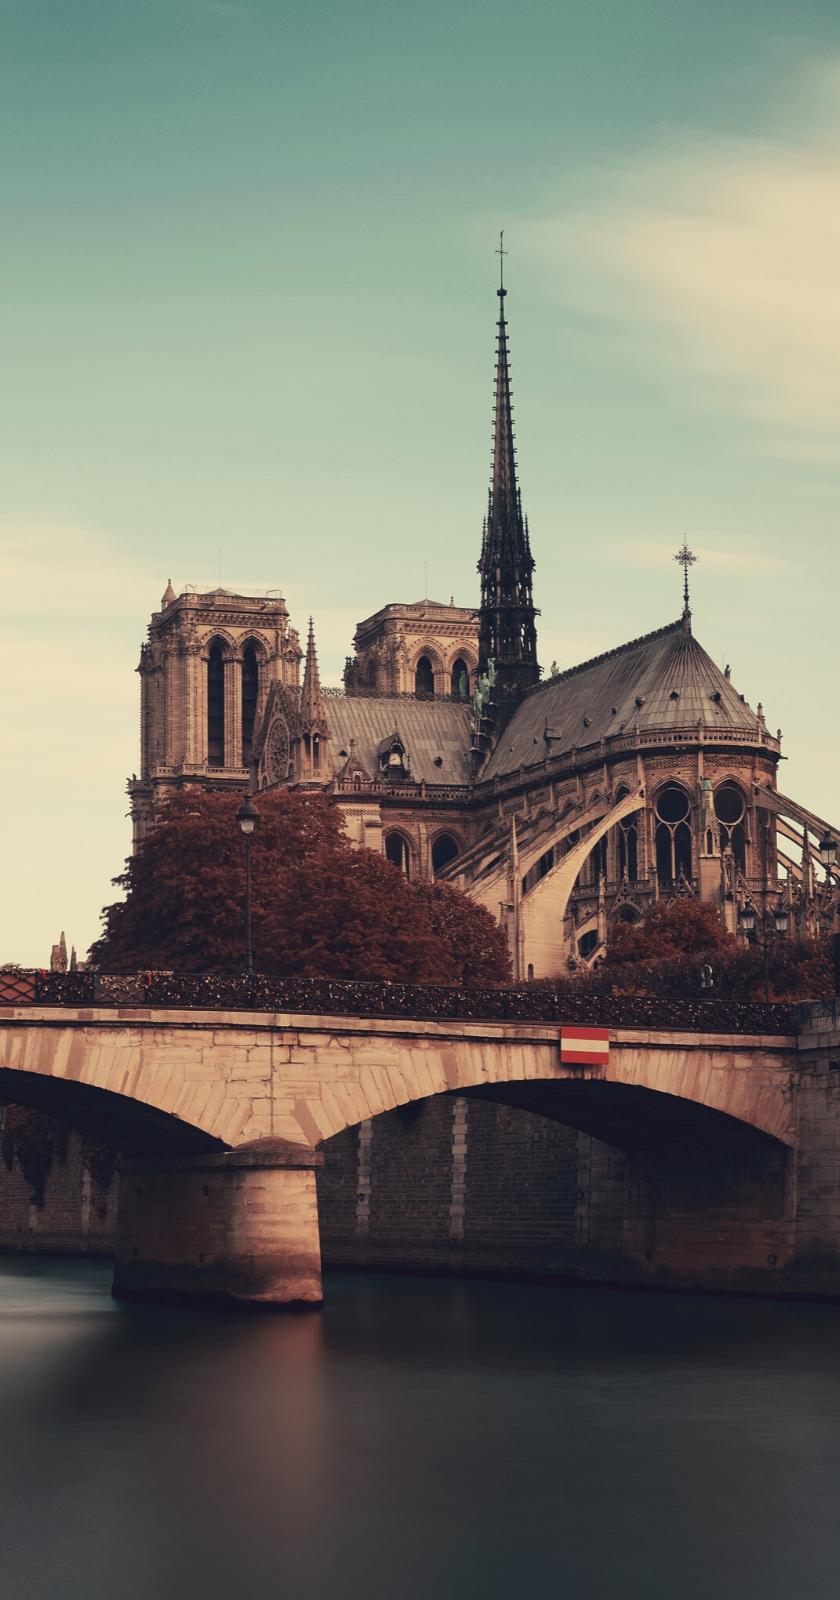 Wallpapers for iPhone best Paris tumblr aesthetics